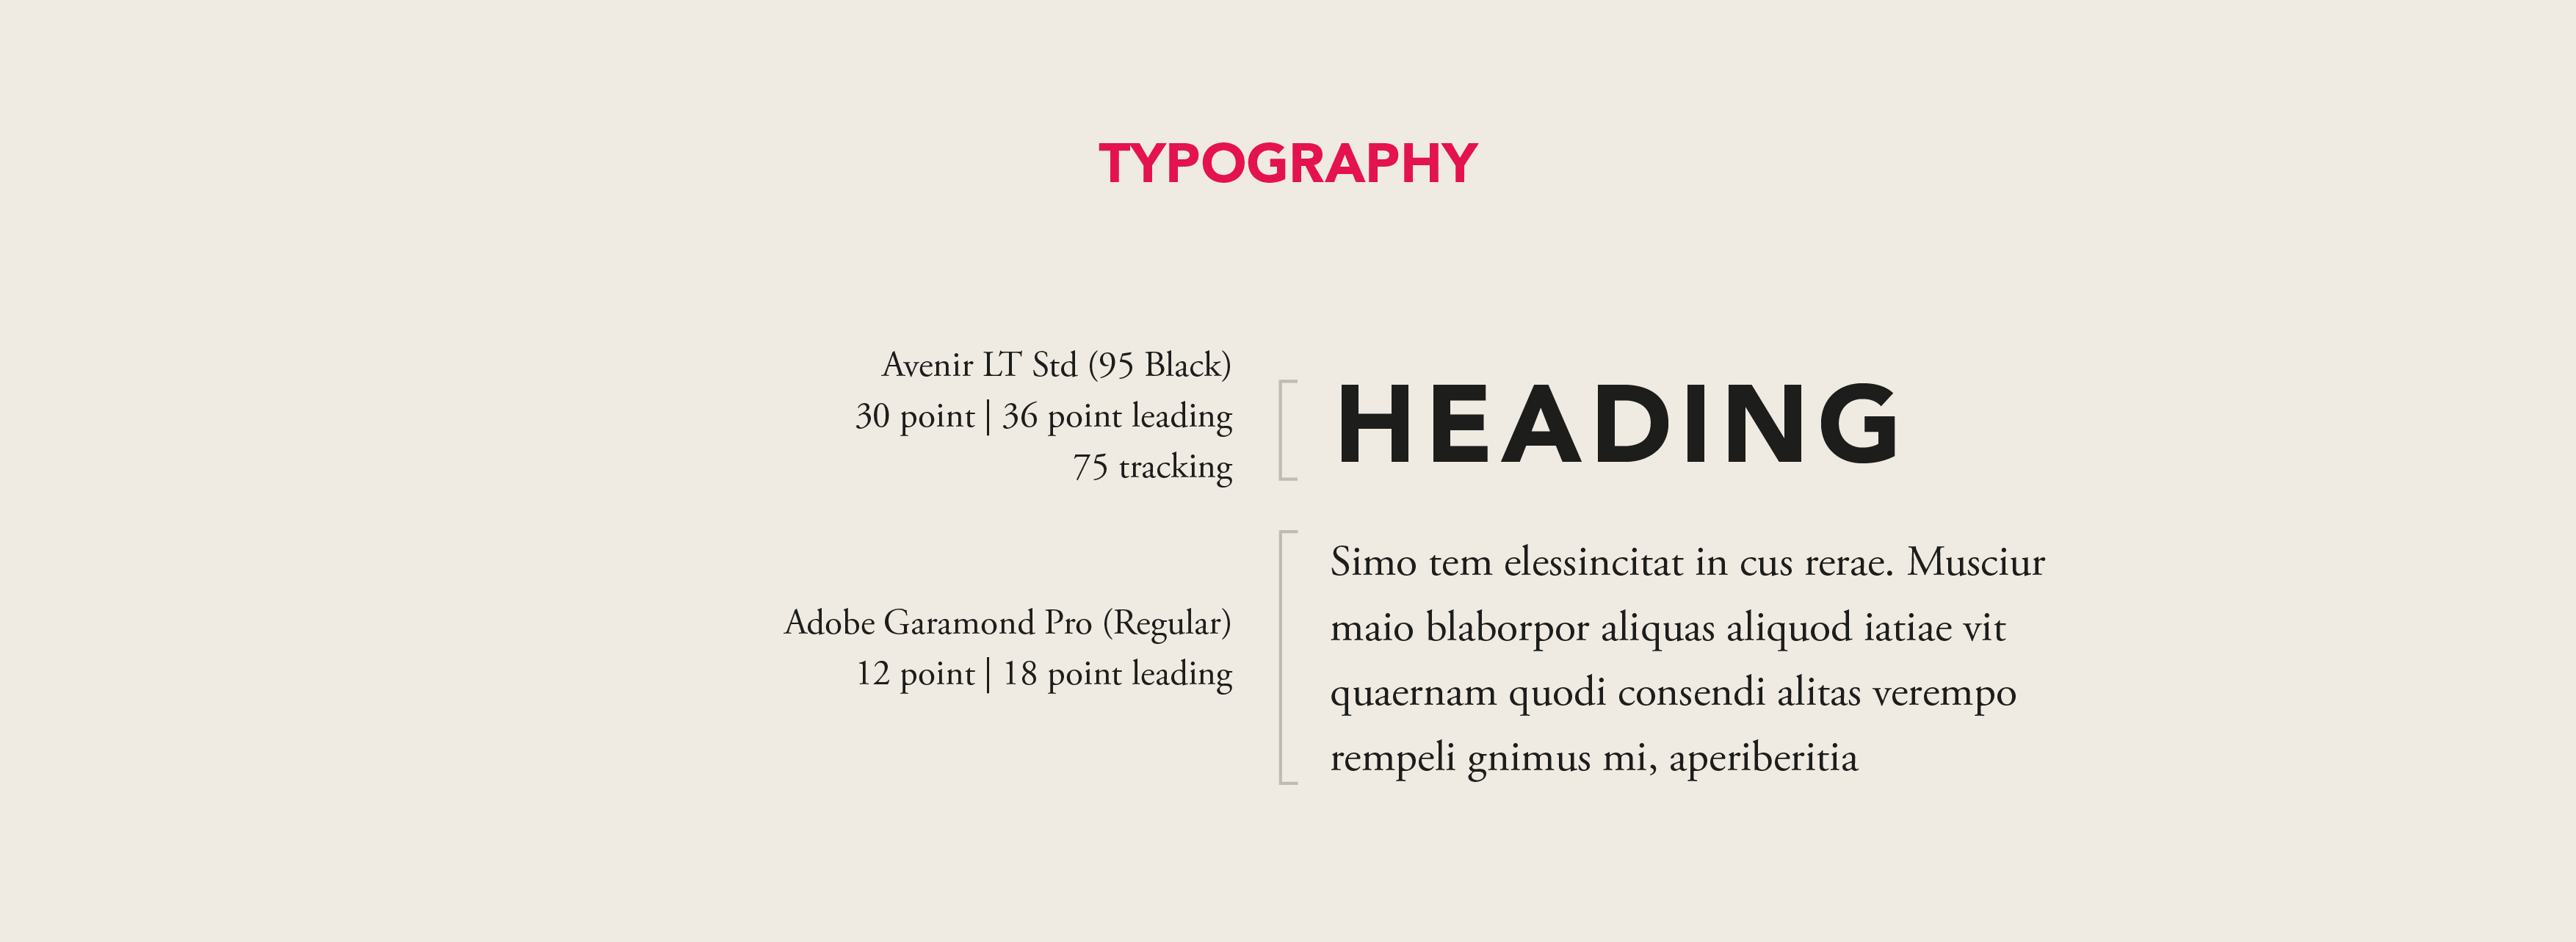 DALI Typography